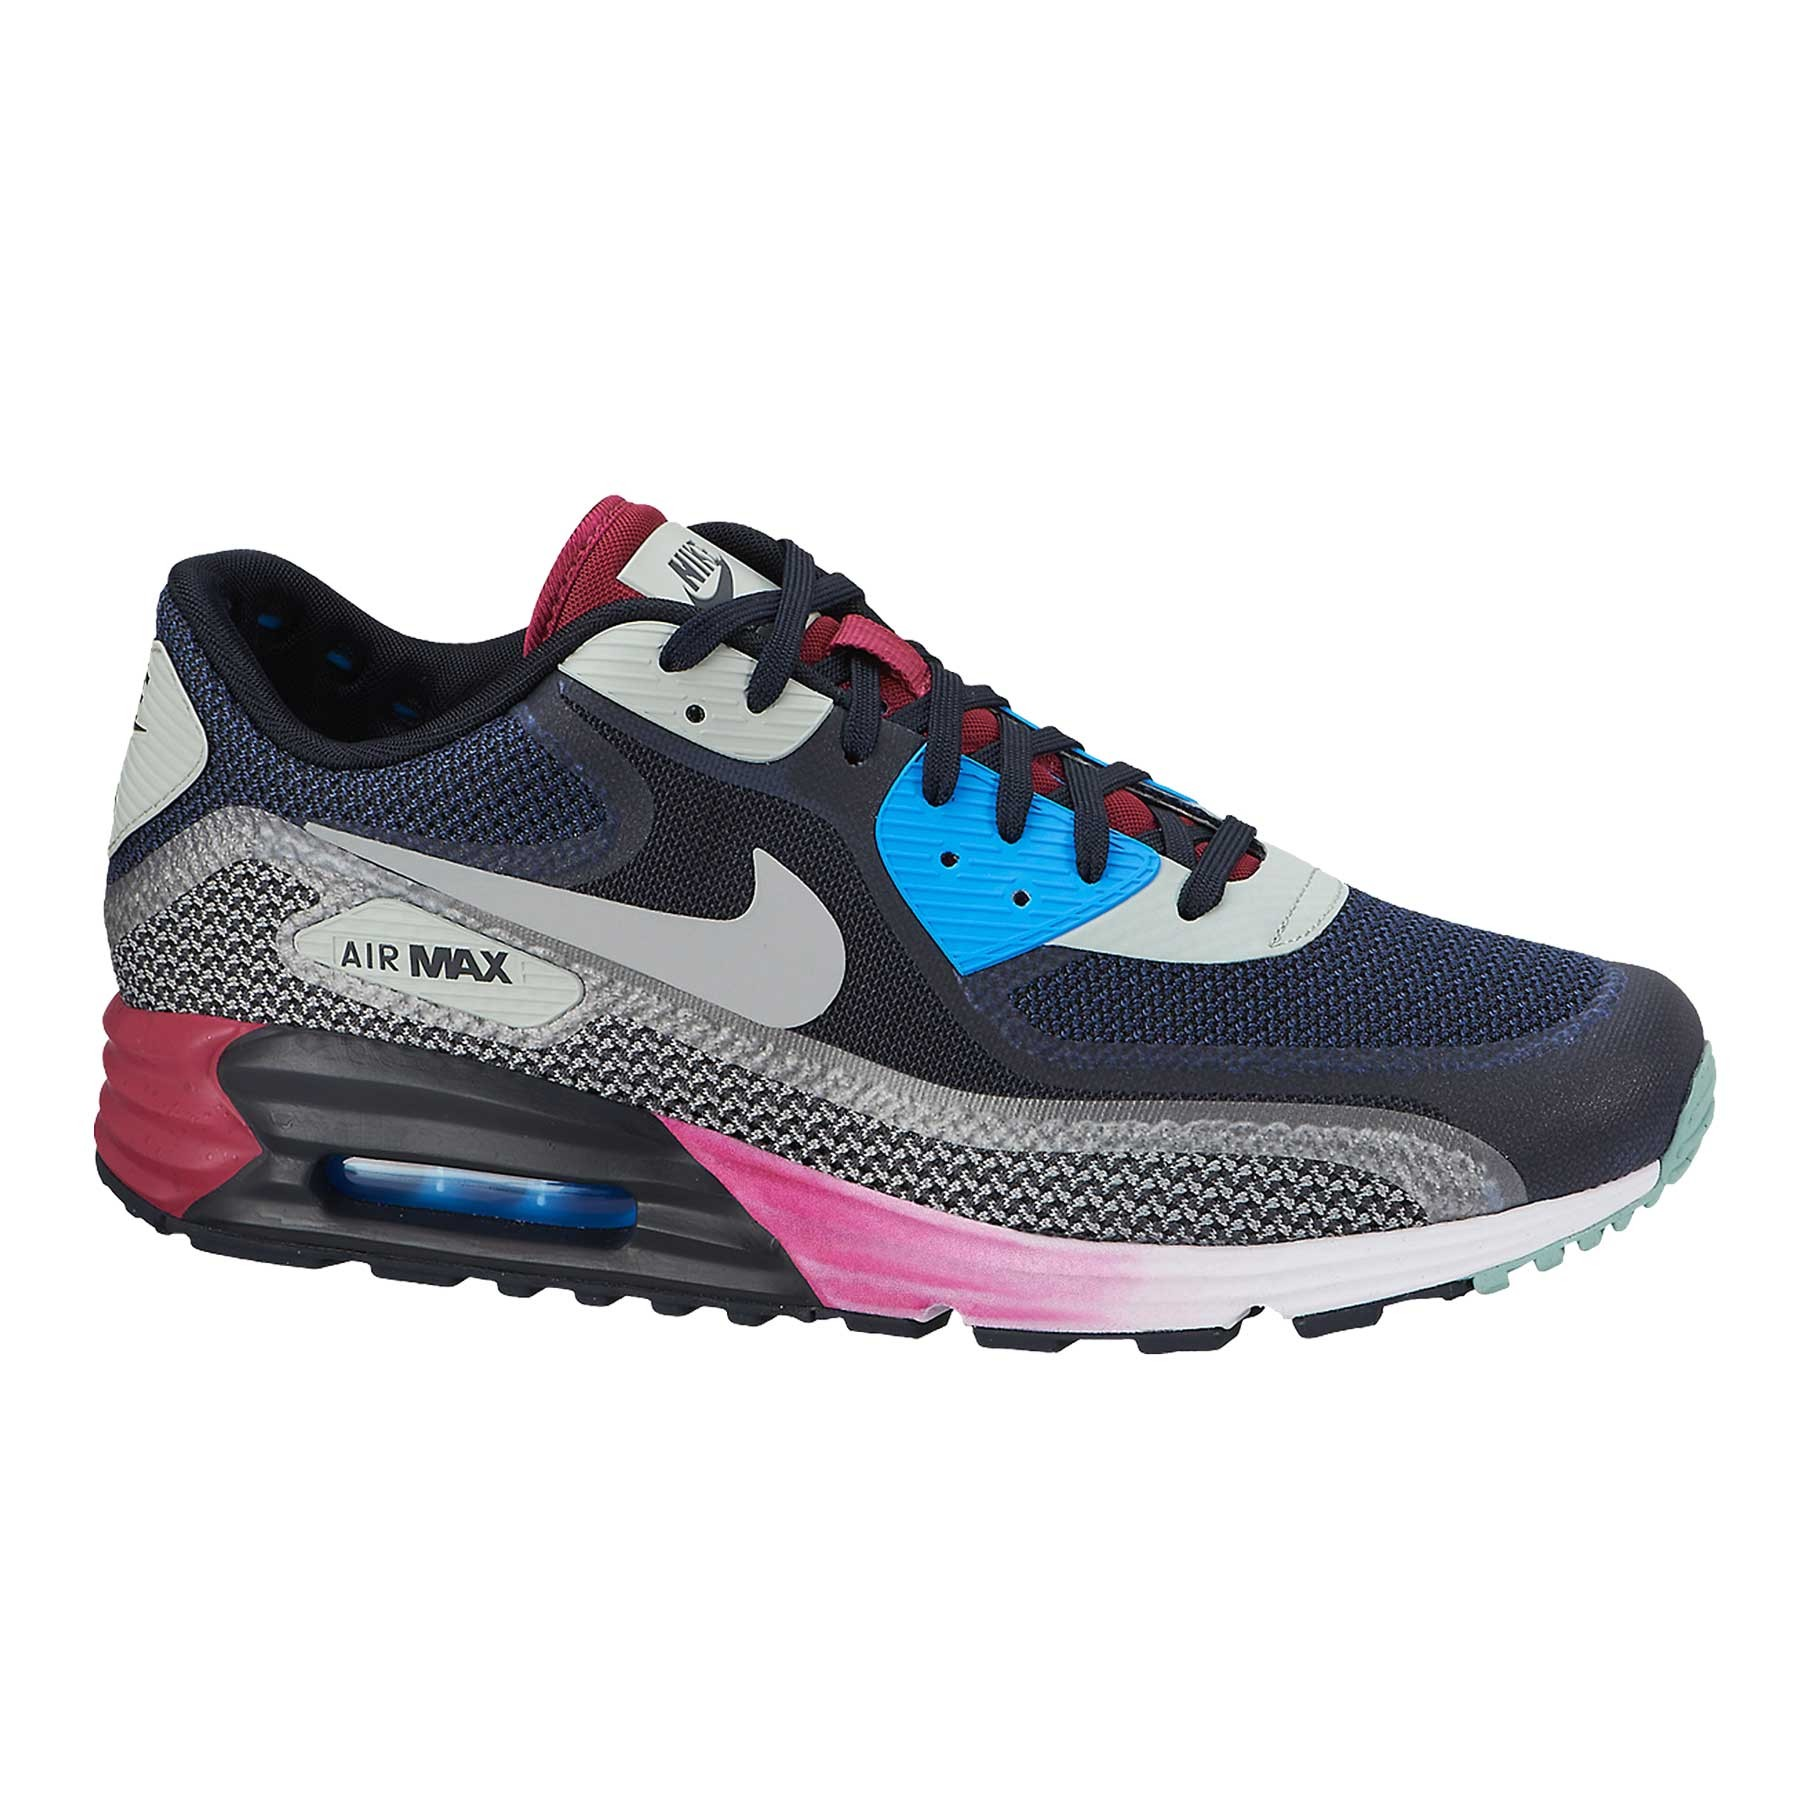 f4d4b78d4bfc1 Nike Roshe Run One Womens Black Safety Toe Sneakers